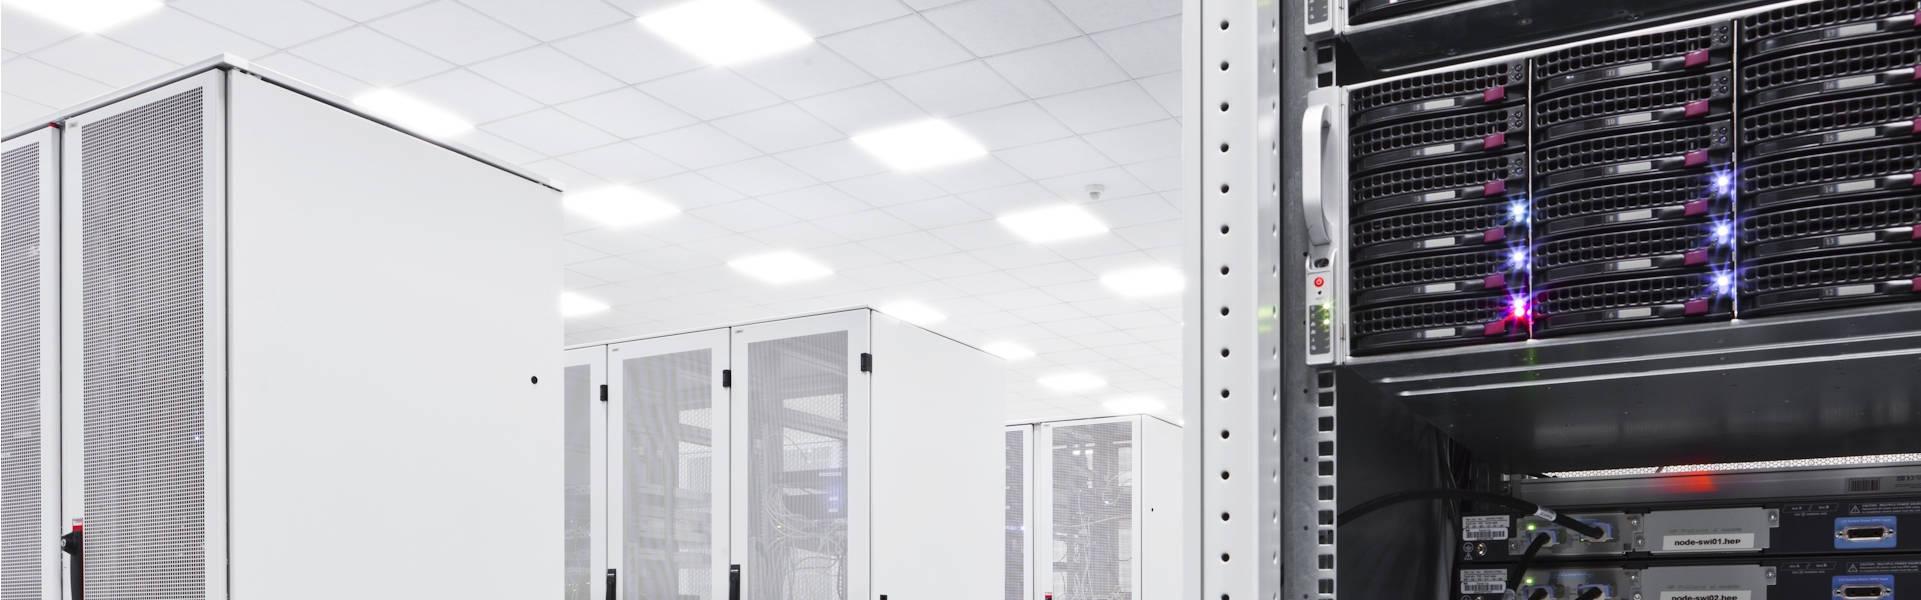 Data Center in Hannover